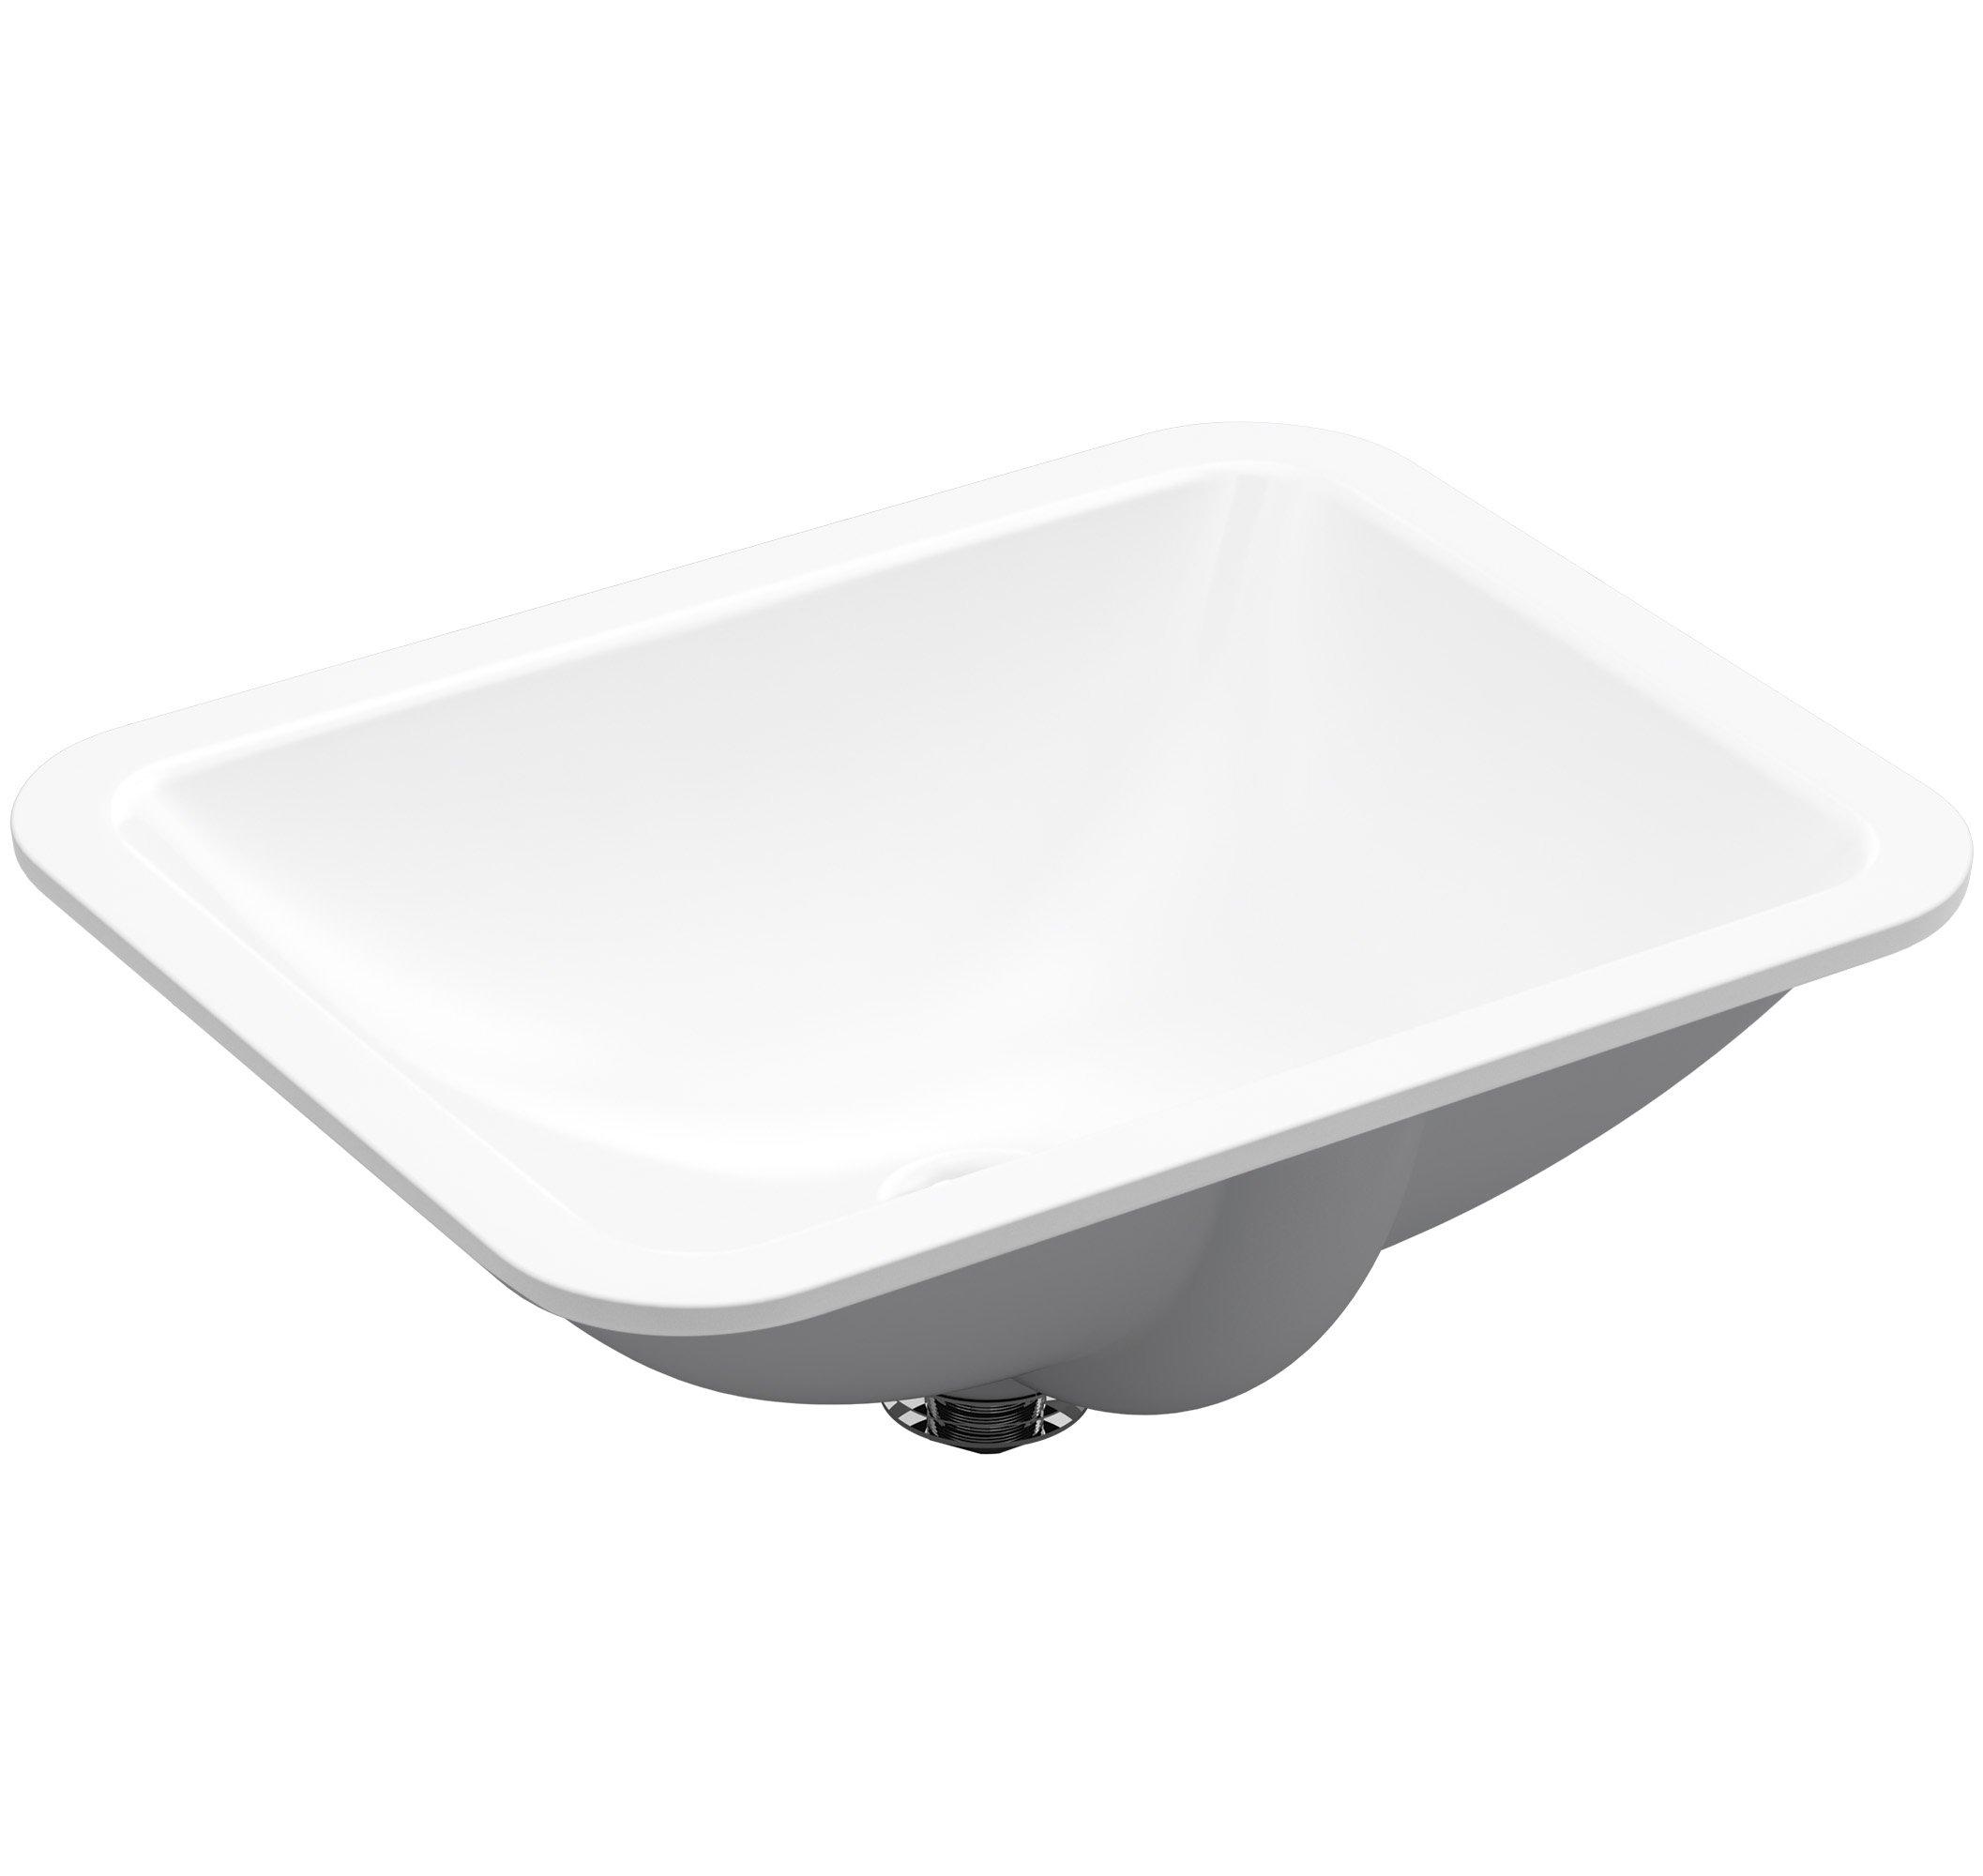 KOHLER K-20000-0 Caxton Rectangle 20-5/16 x 15-3/4 In. Undermount Bathroom Sink, White